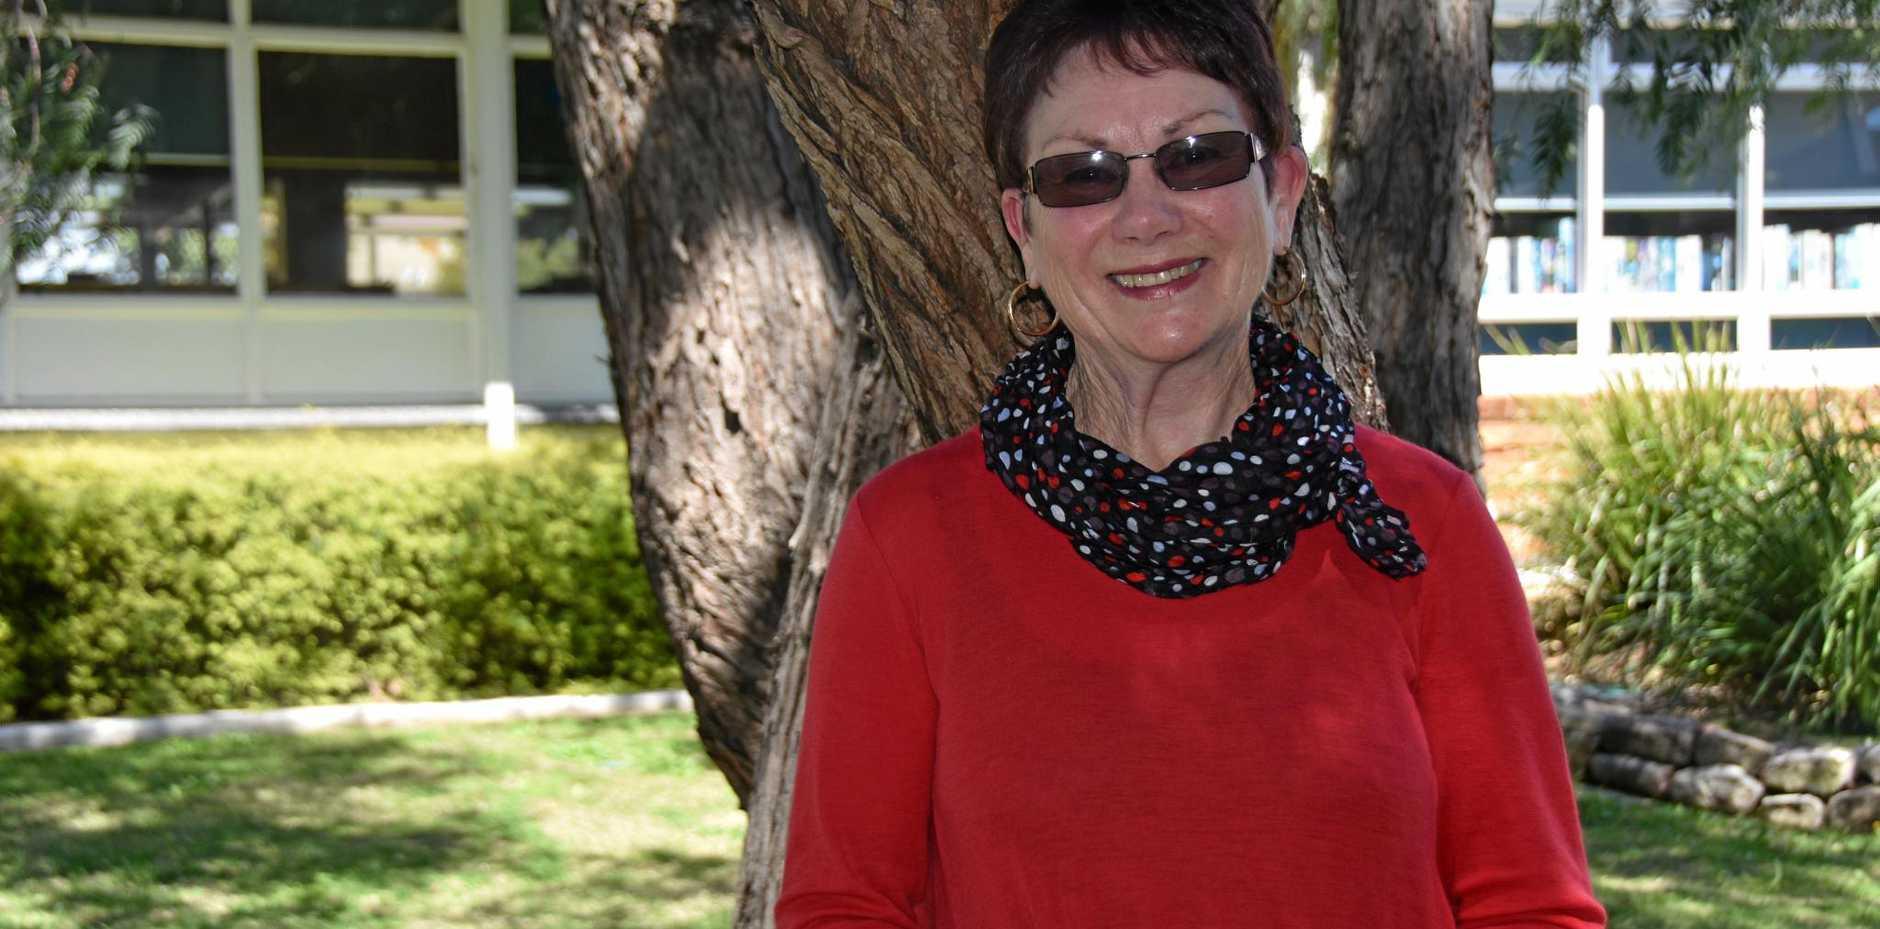 GET CHECKED: Cancer survivor Lynn Lane encouraged all those to keep up their regular cancer checks.